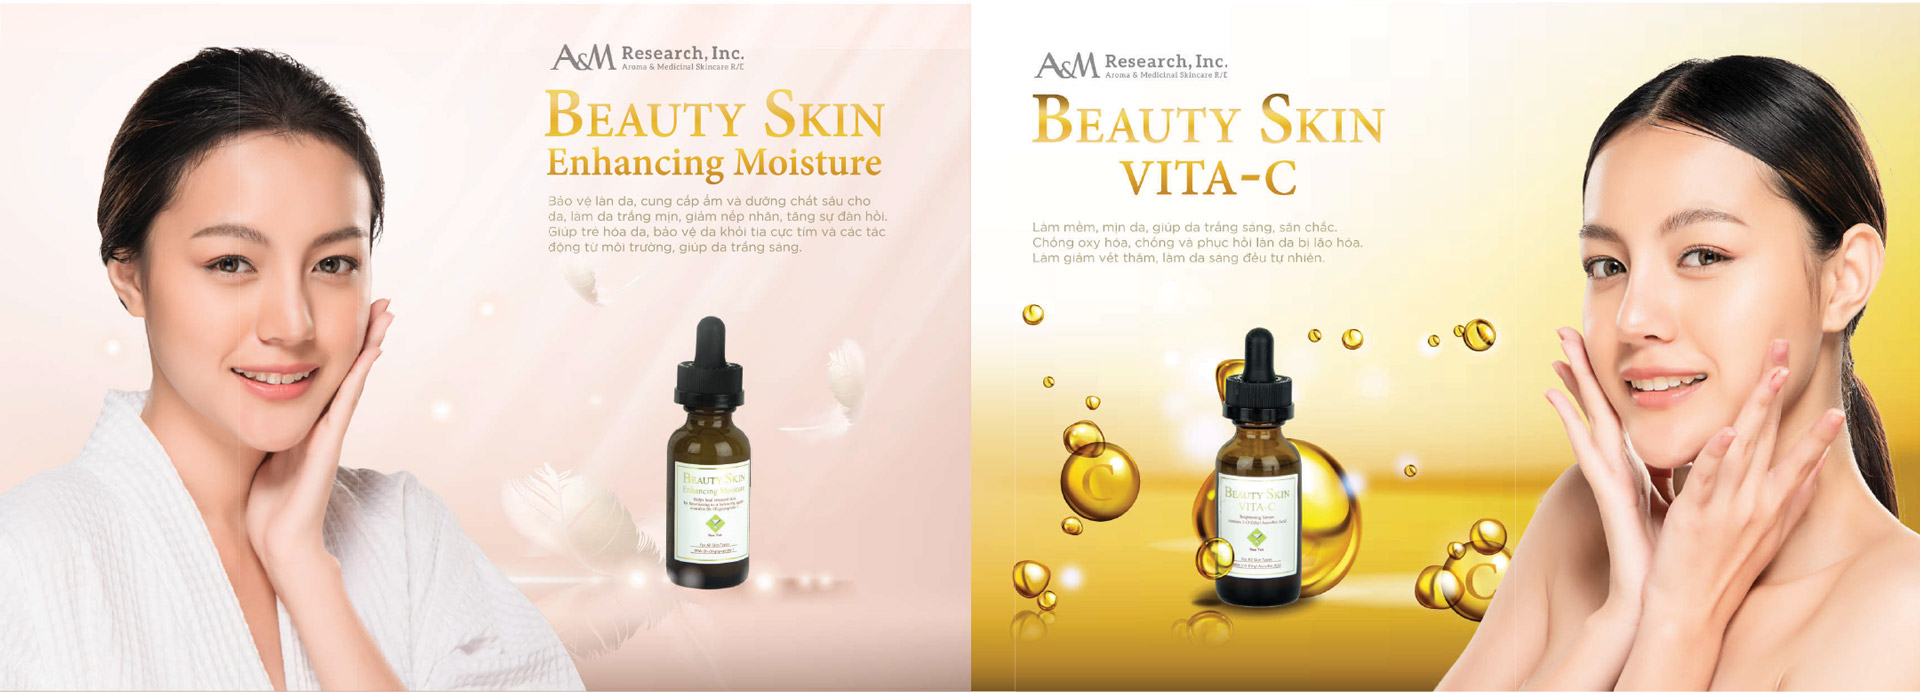 Beauty Skin Enhancing Moisture 30ml